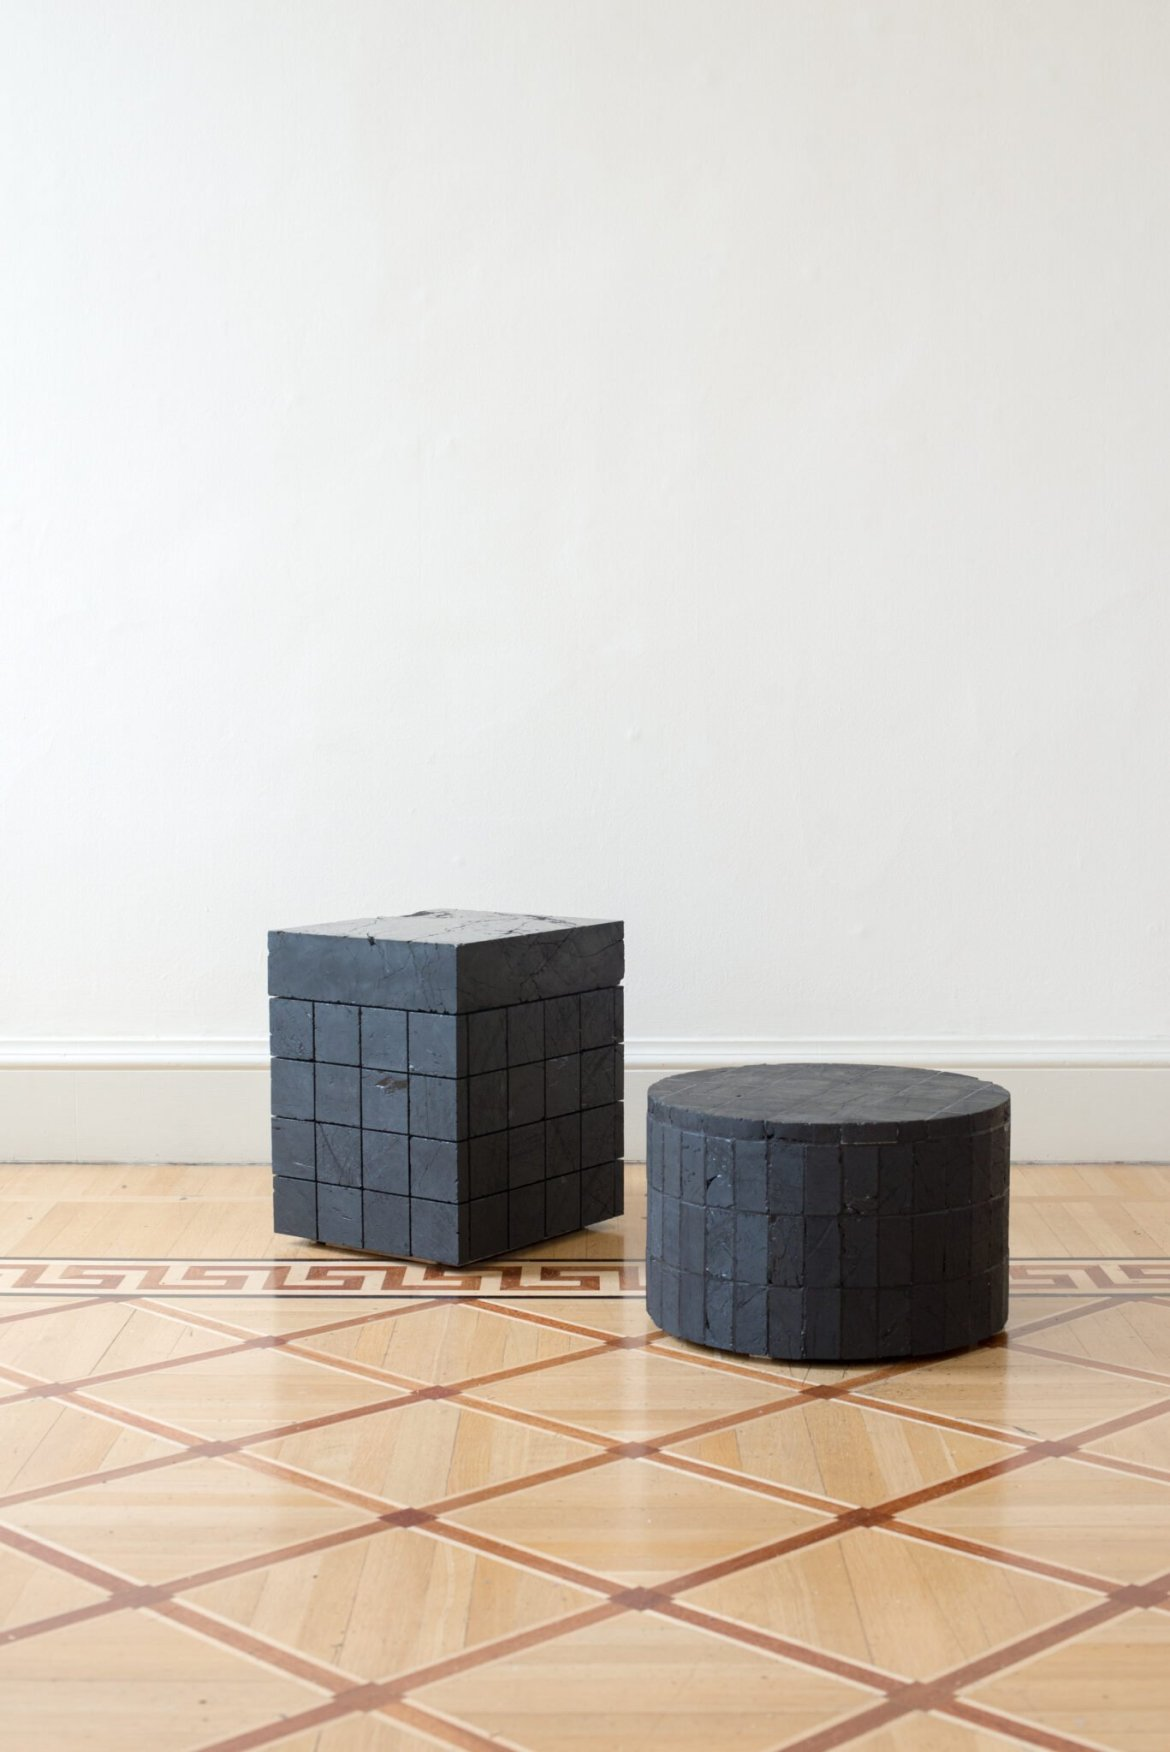 nomads-movimento-scene-of-design-Anhtractite-Coal-Side-Table-Jesper-Eriksson-huskdesignblog